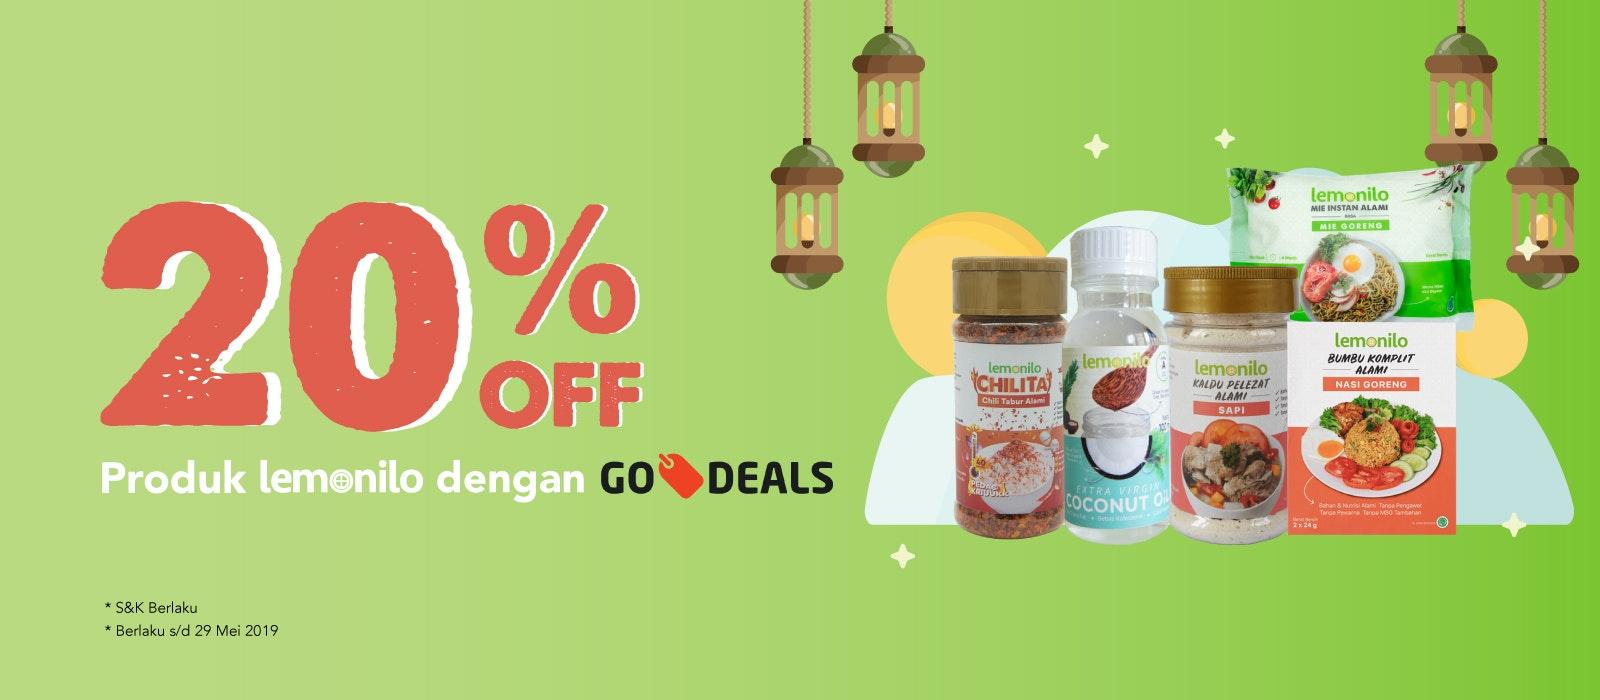 20% OFF Produk Lemonilo dengan Go-Deals